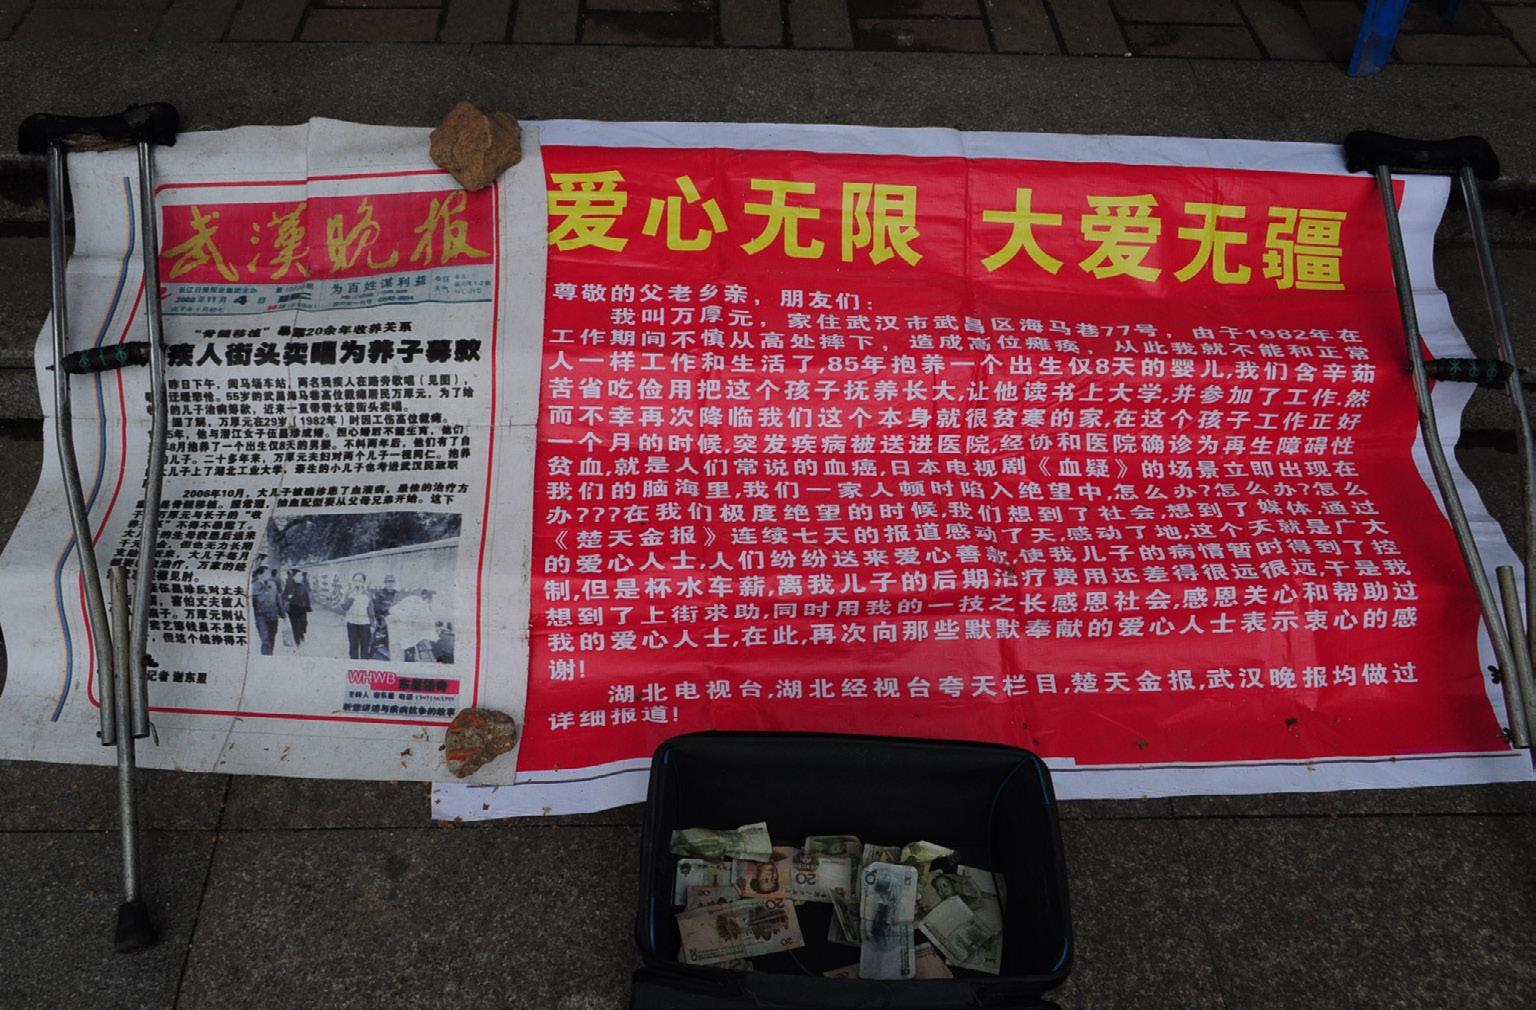 FIGURE-1.-Banner-displayed-at-Promoter-Zhuang's-park-stage.